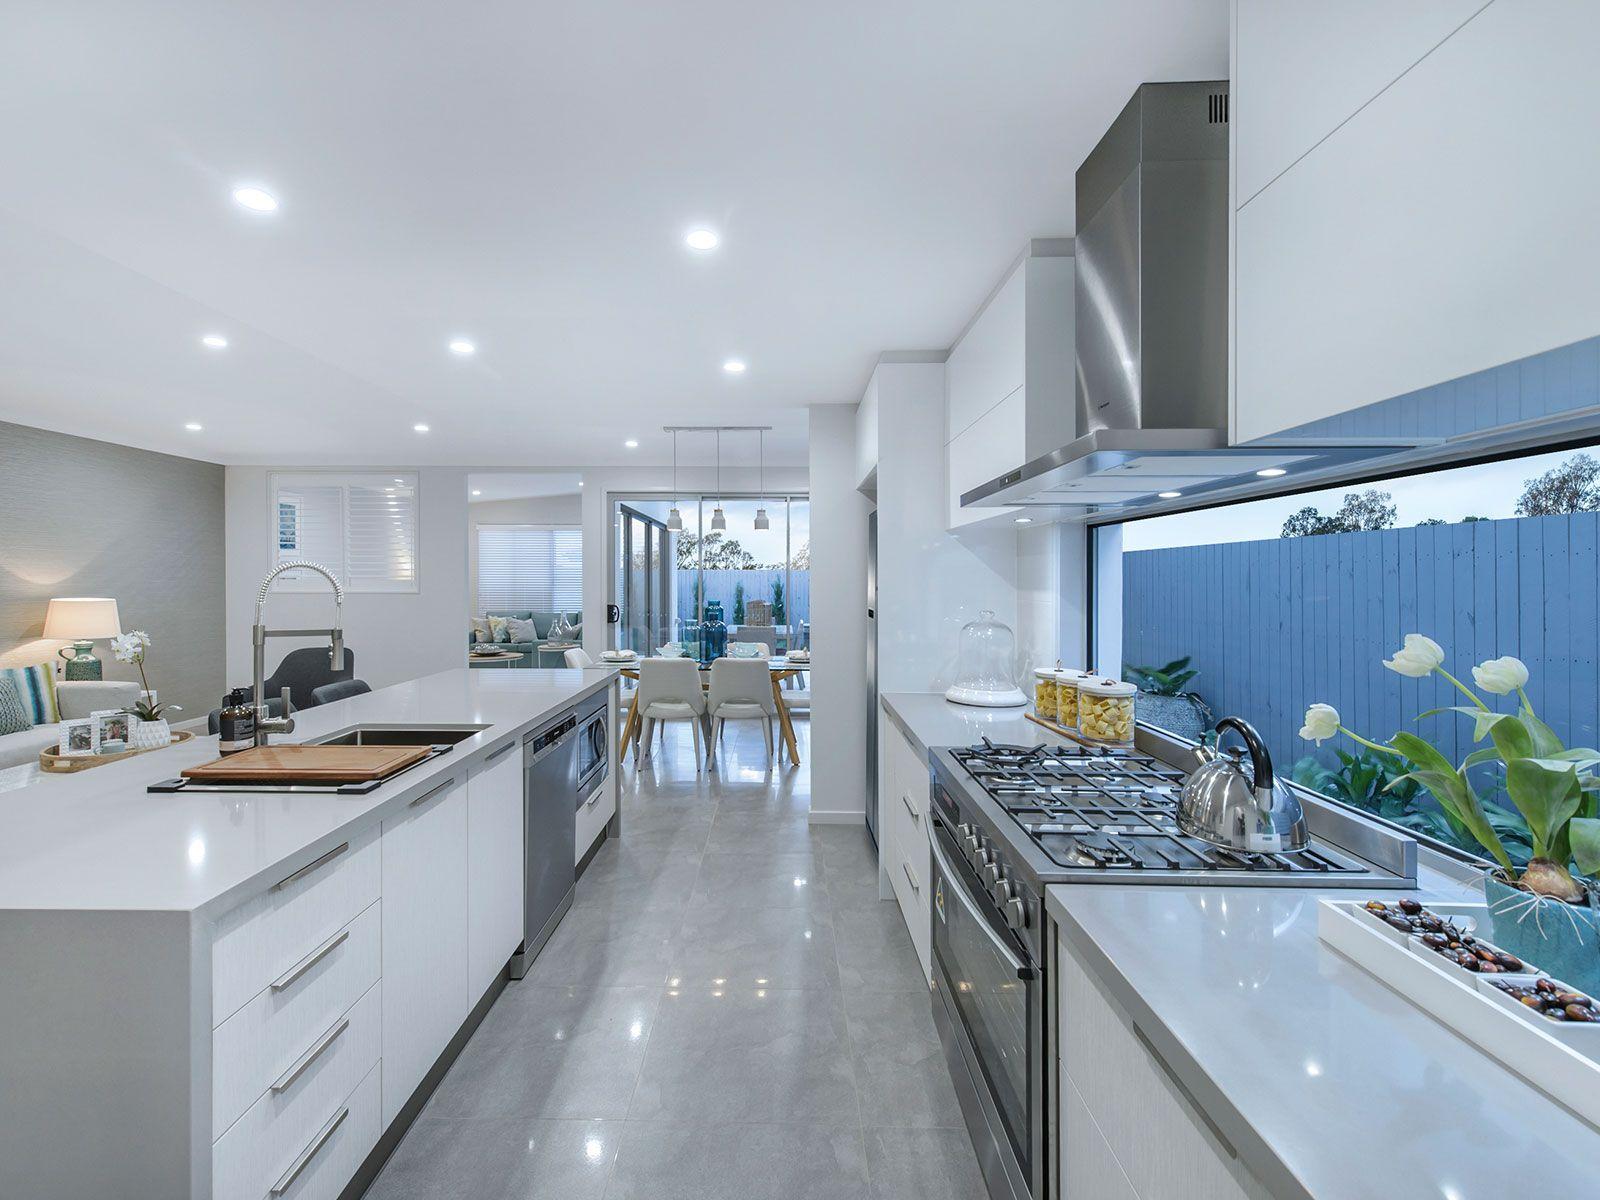 Ausbuild | Kitchen | Pinterest | House, Kitchens and Display